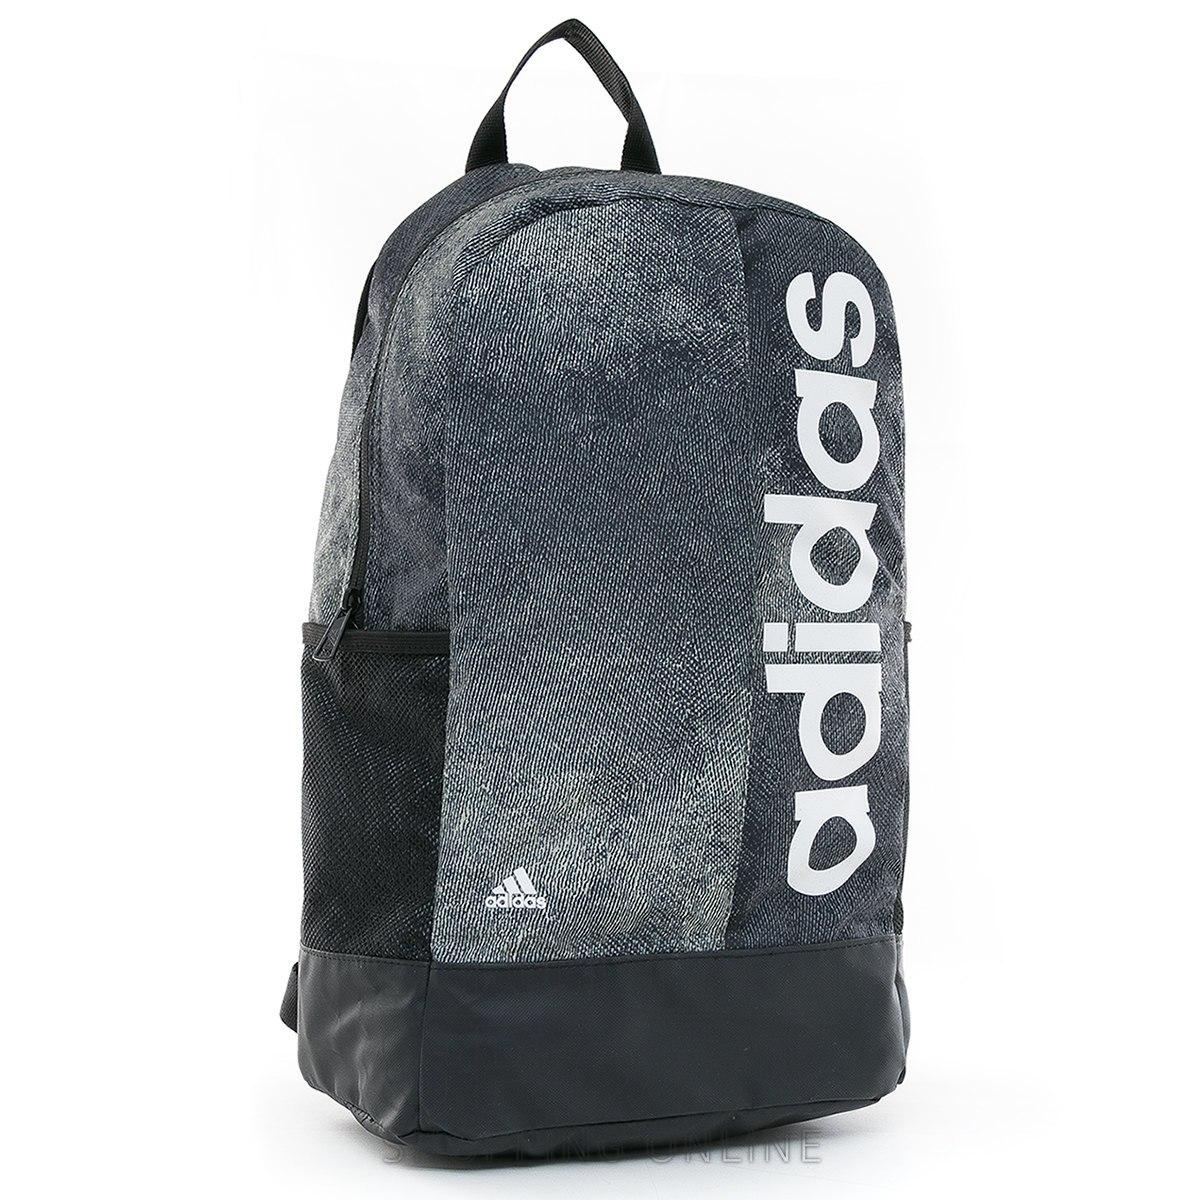 aa2c1149e69a mochila adidas linear performance backpack. Cargando zoom.